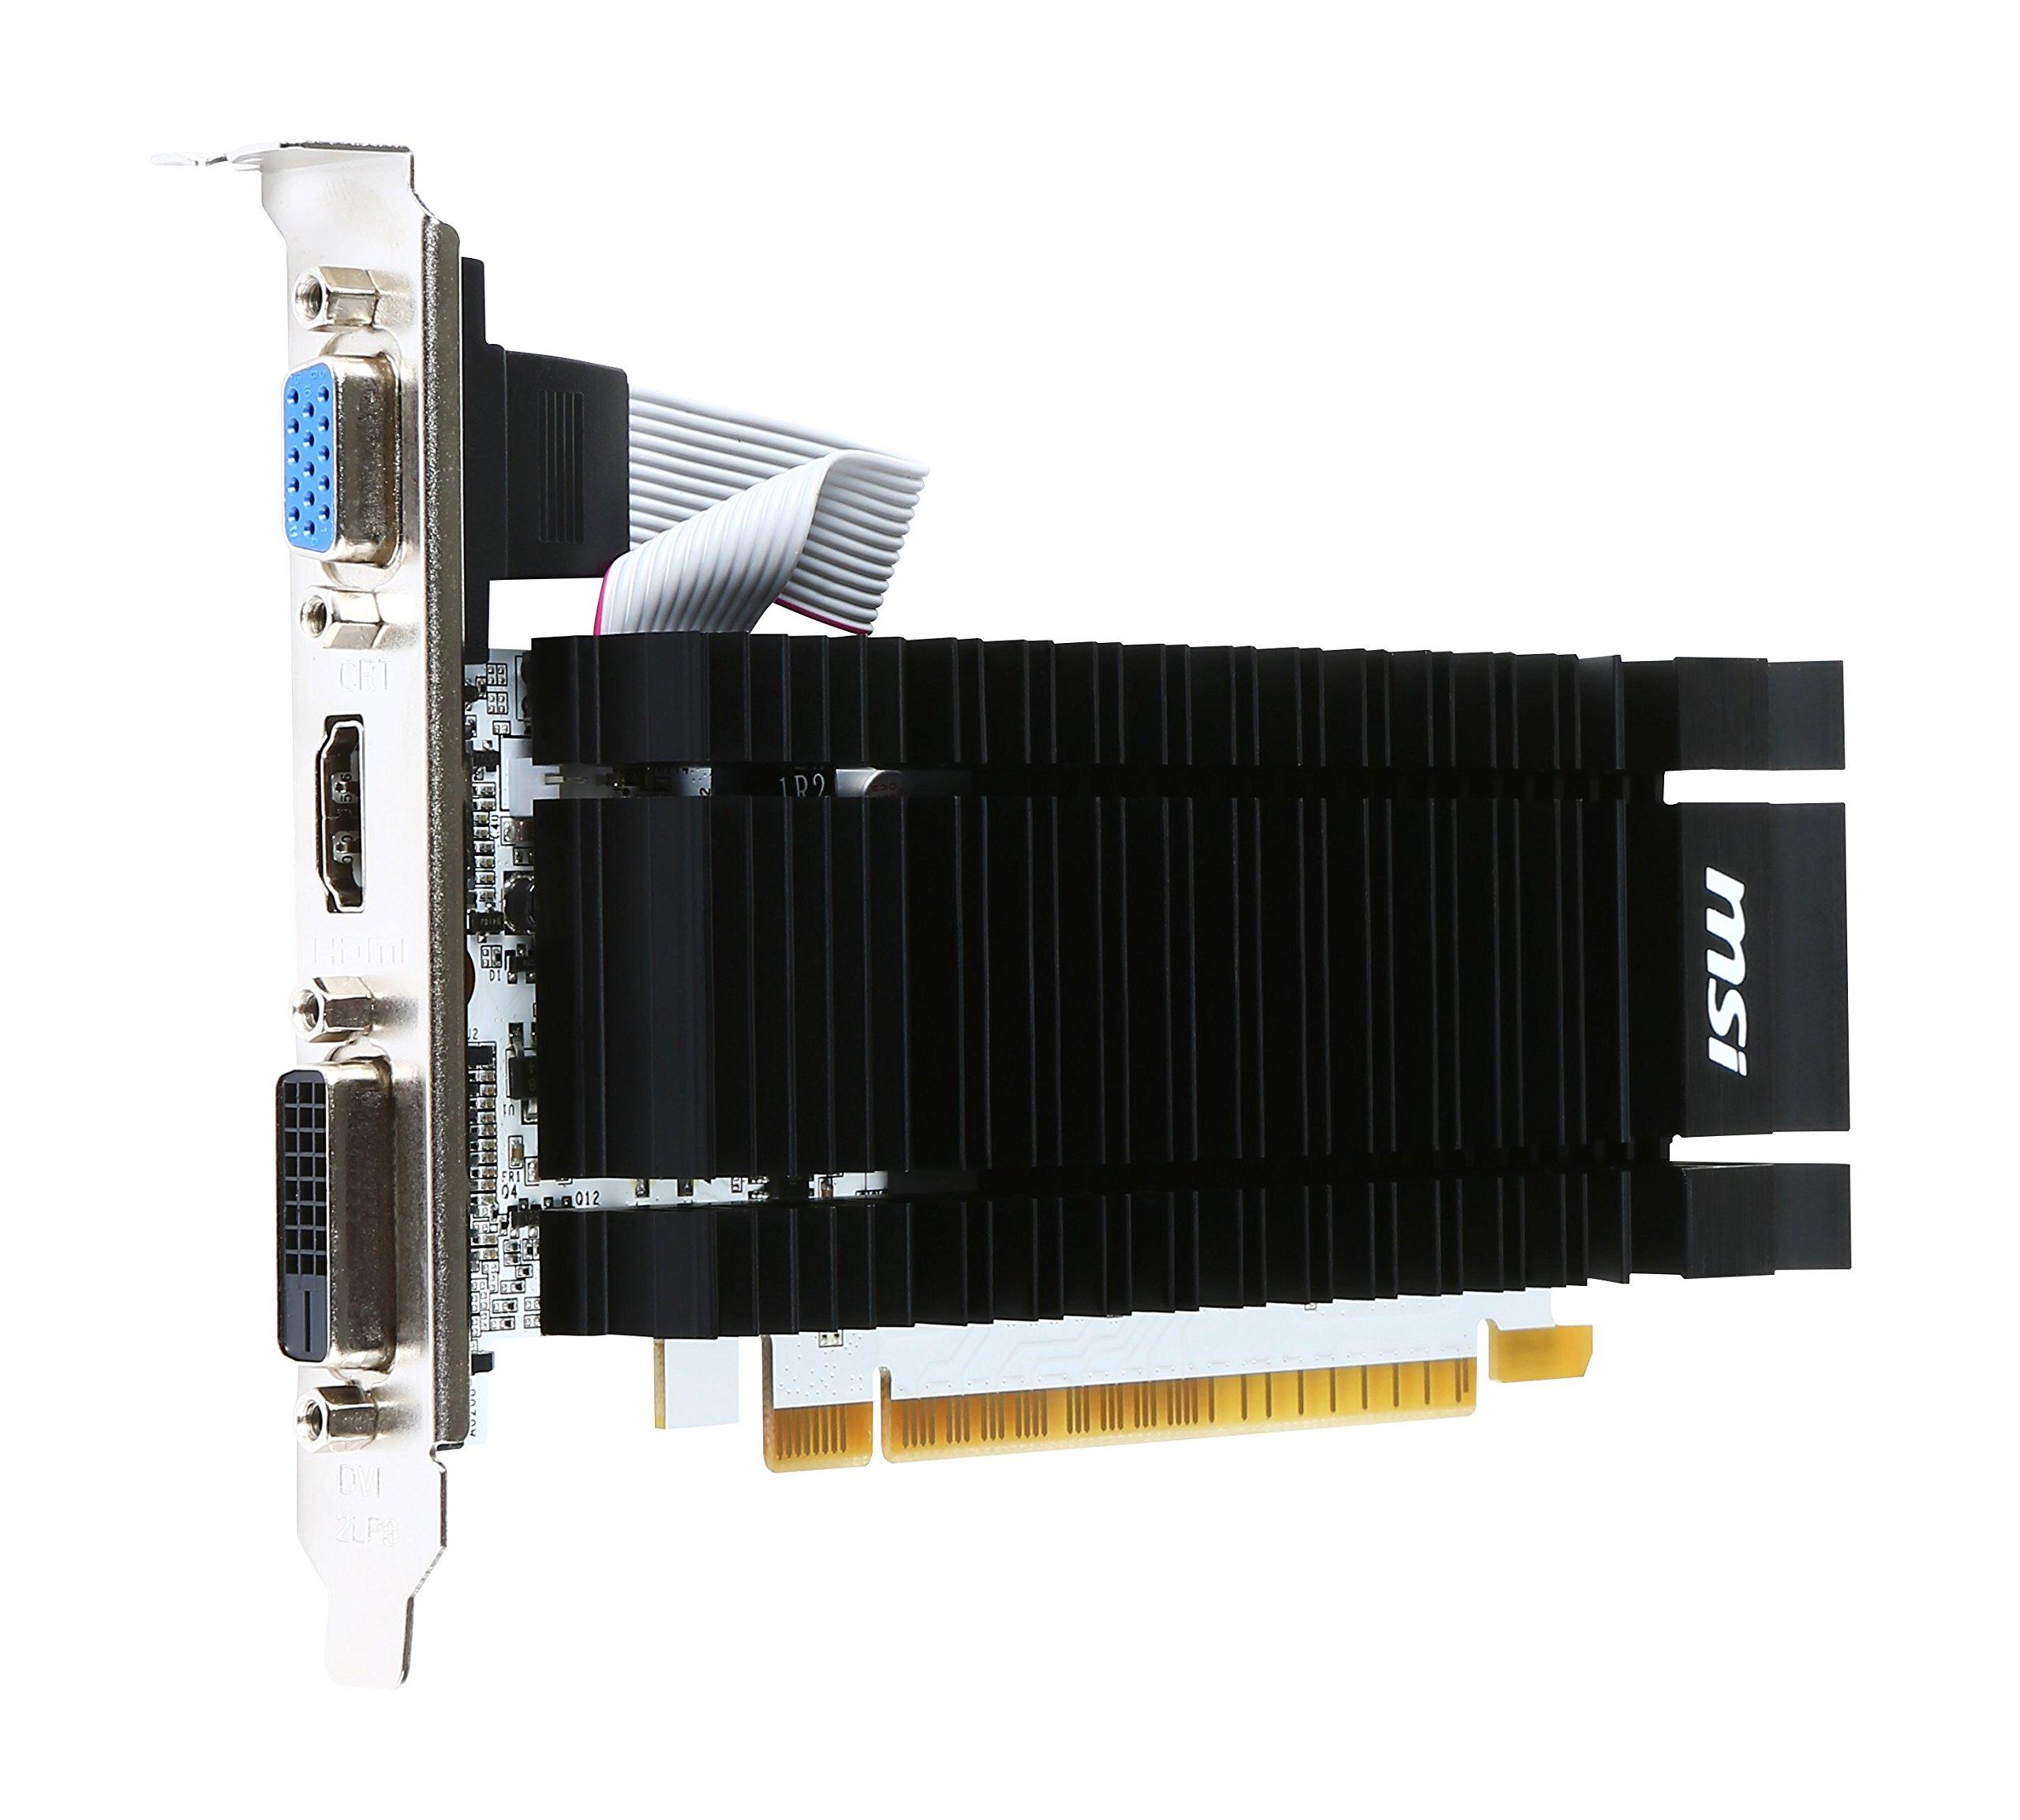 MSI Computer N730K-2GD3H/LP NVIDIA GeForce GT 730 2GB DDR3 VGA/DVI/HDMI Low Profile PCI-Express Video Card by MSI (Image #5)